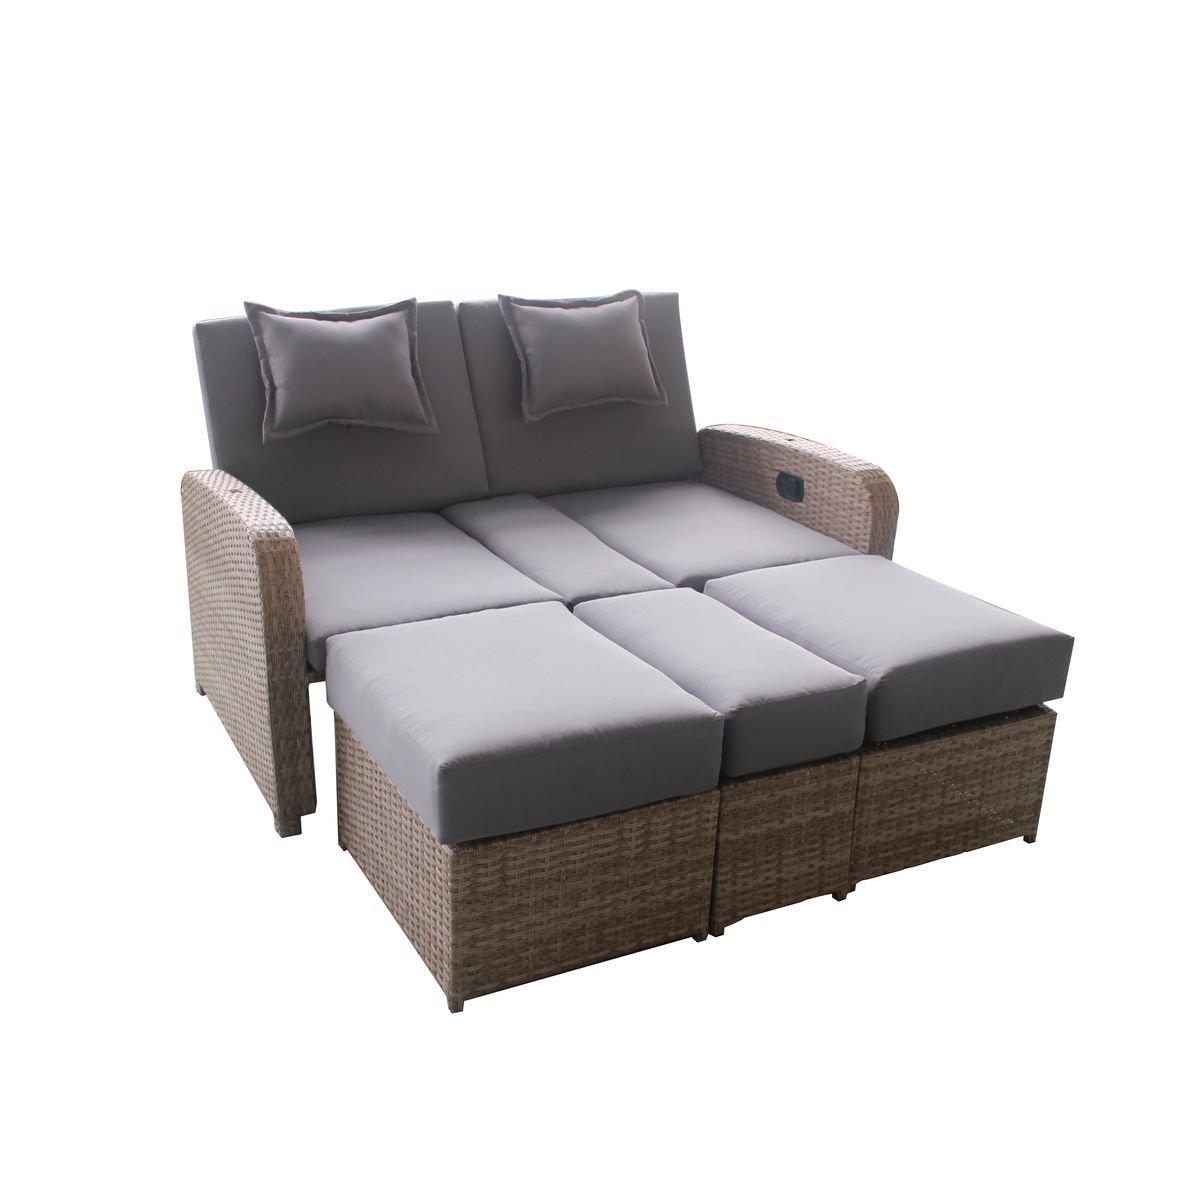 Greemotion Rattan Lounge Bali Sofa Bett Aus Polyrattan Indoor